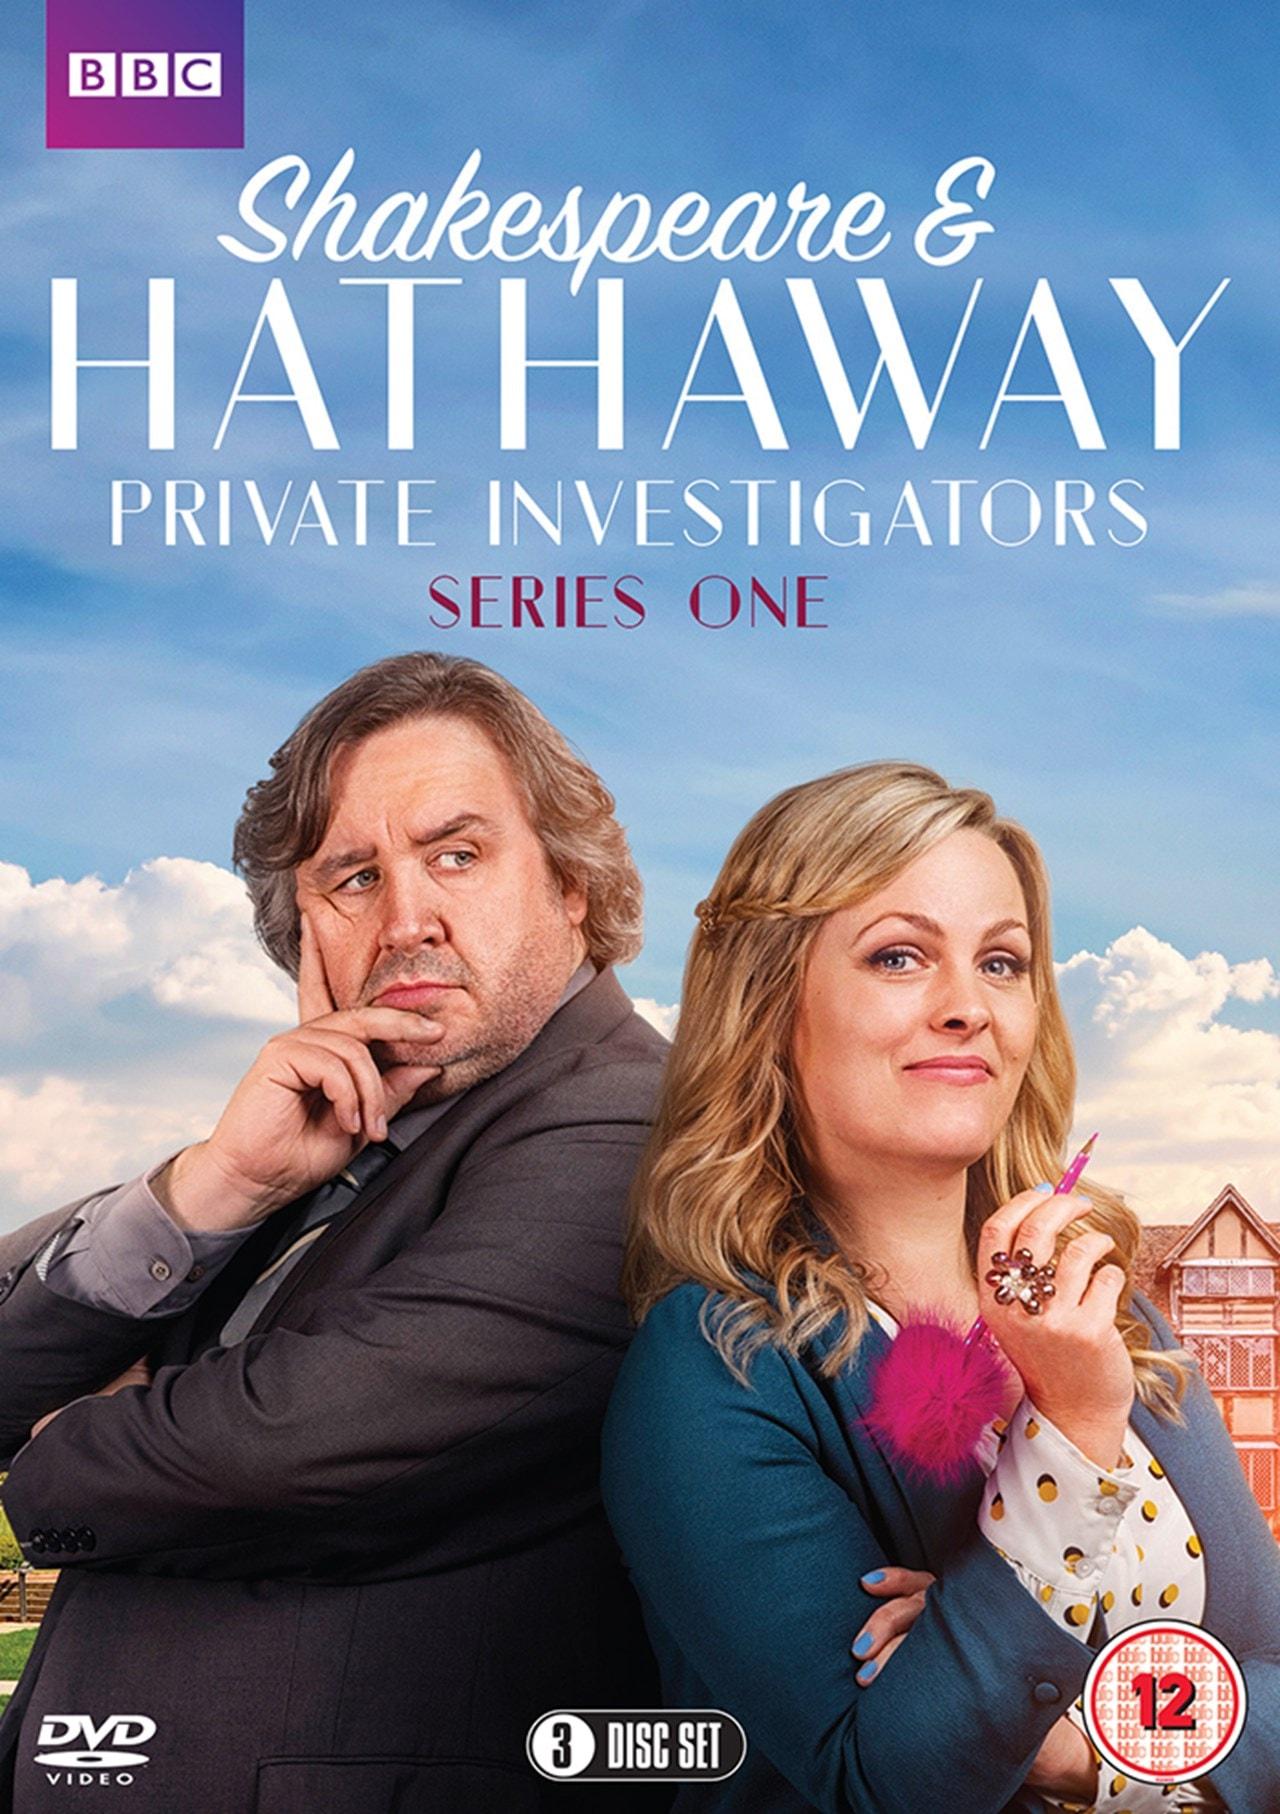 Shakespeare & Hathaway - Private Investigators: Series One - 1